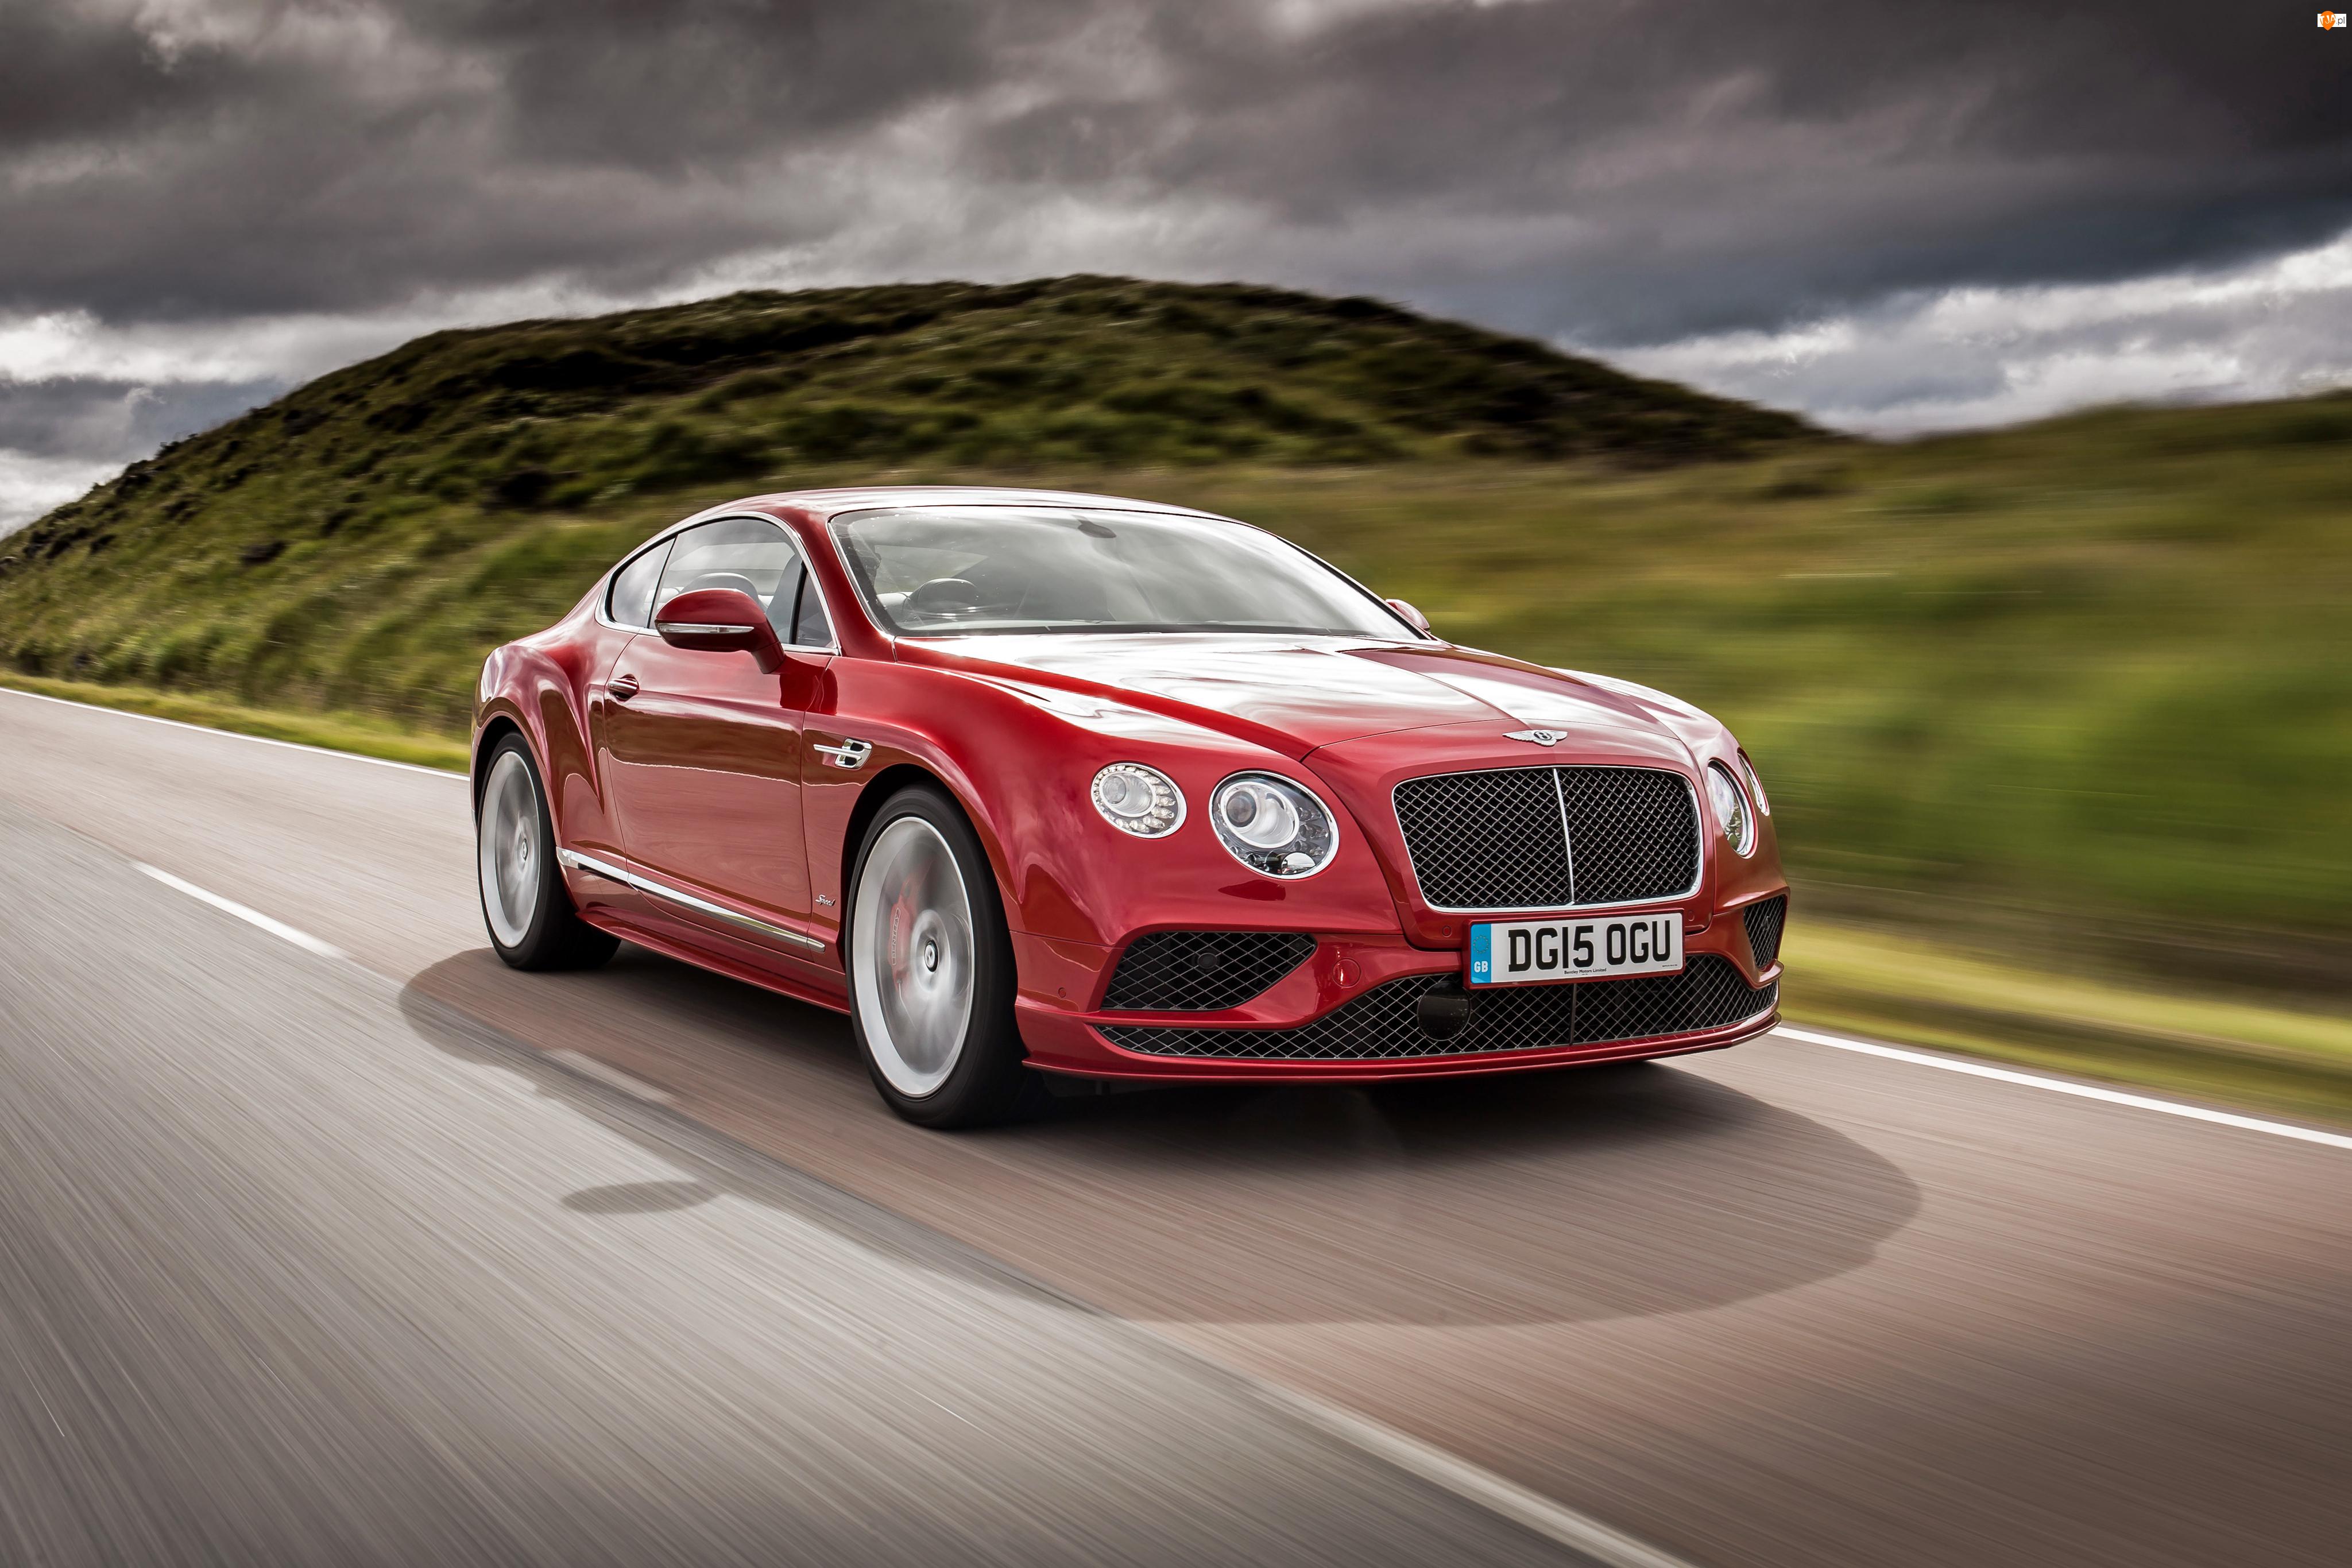 Bentley Continental GT V8 S, 2015